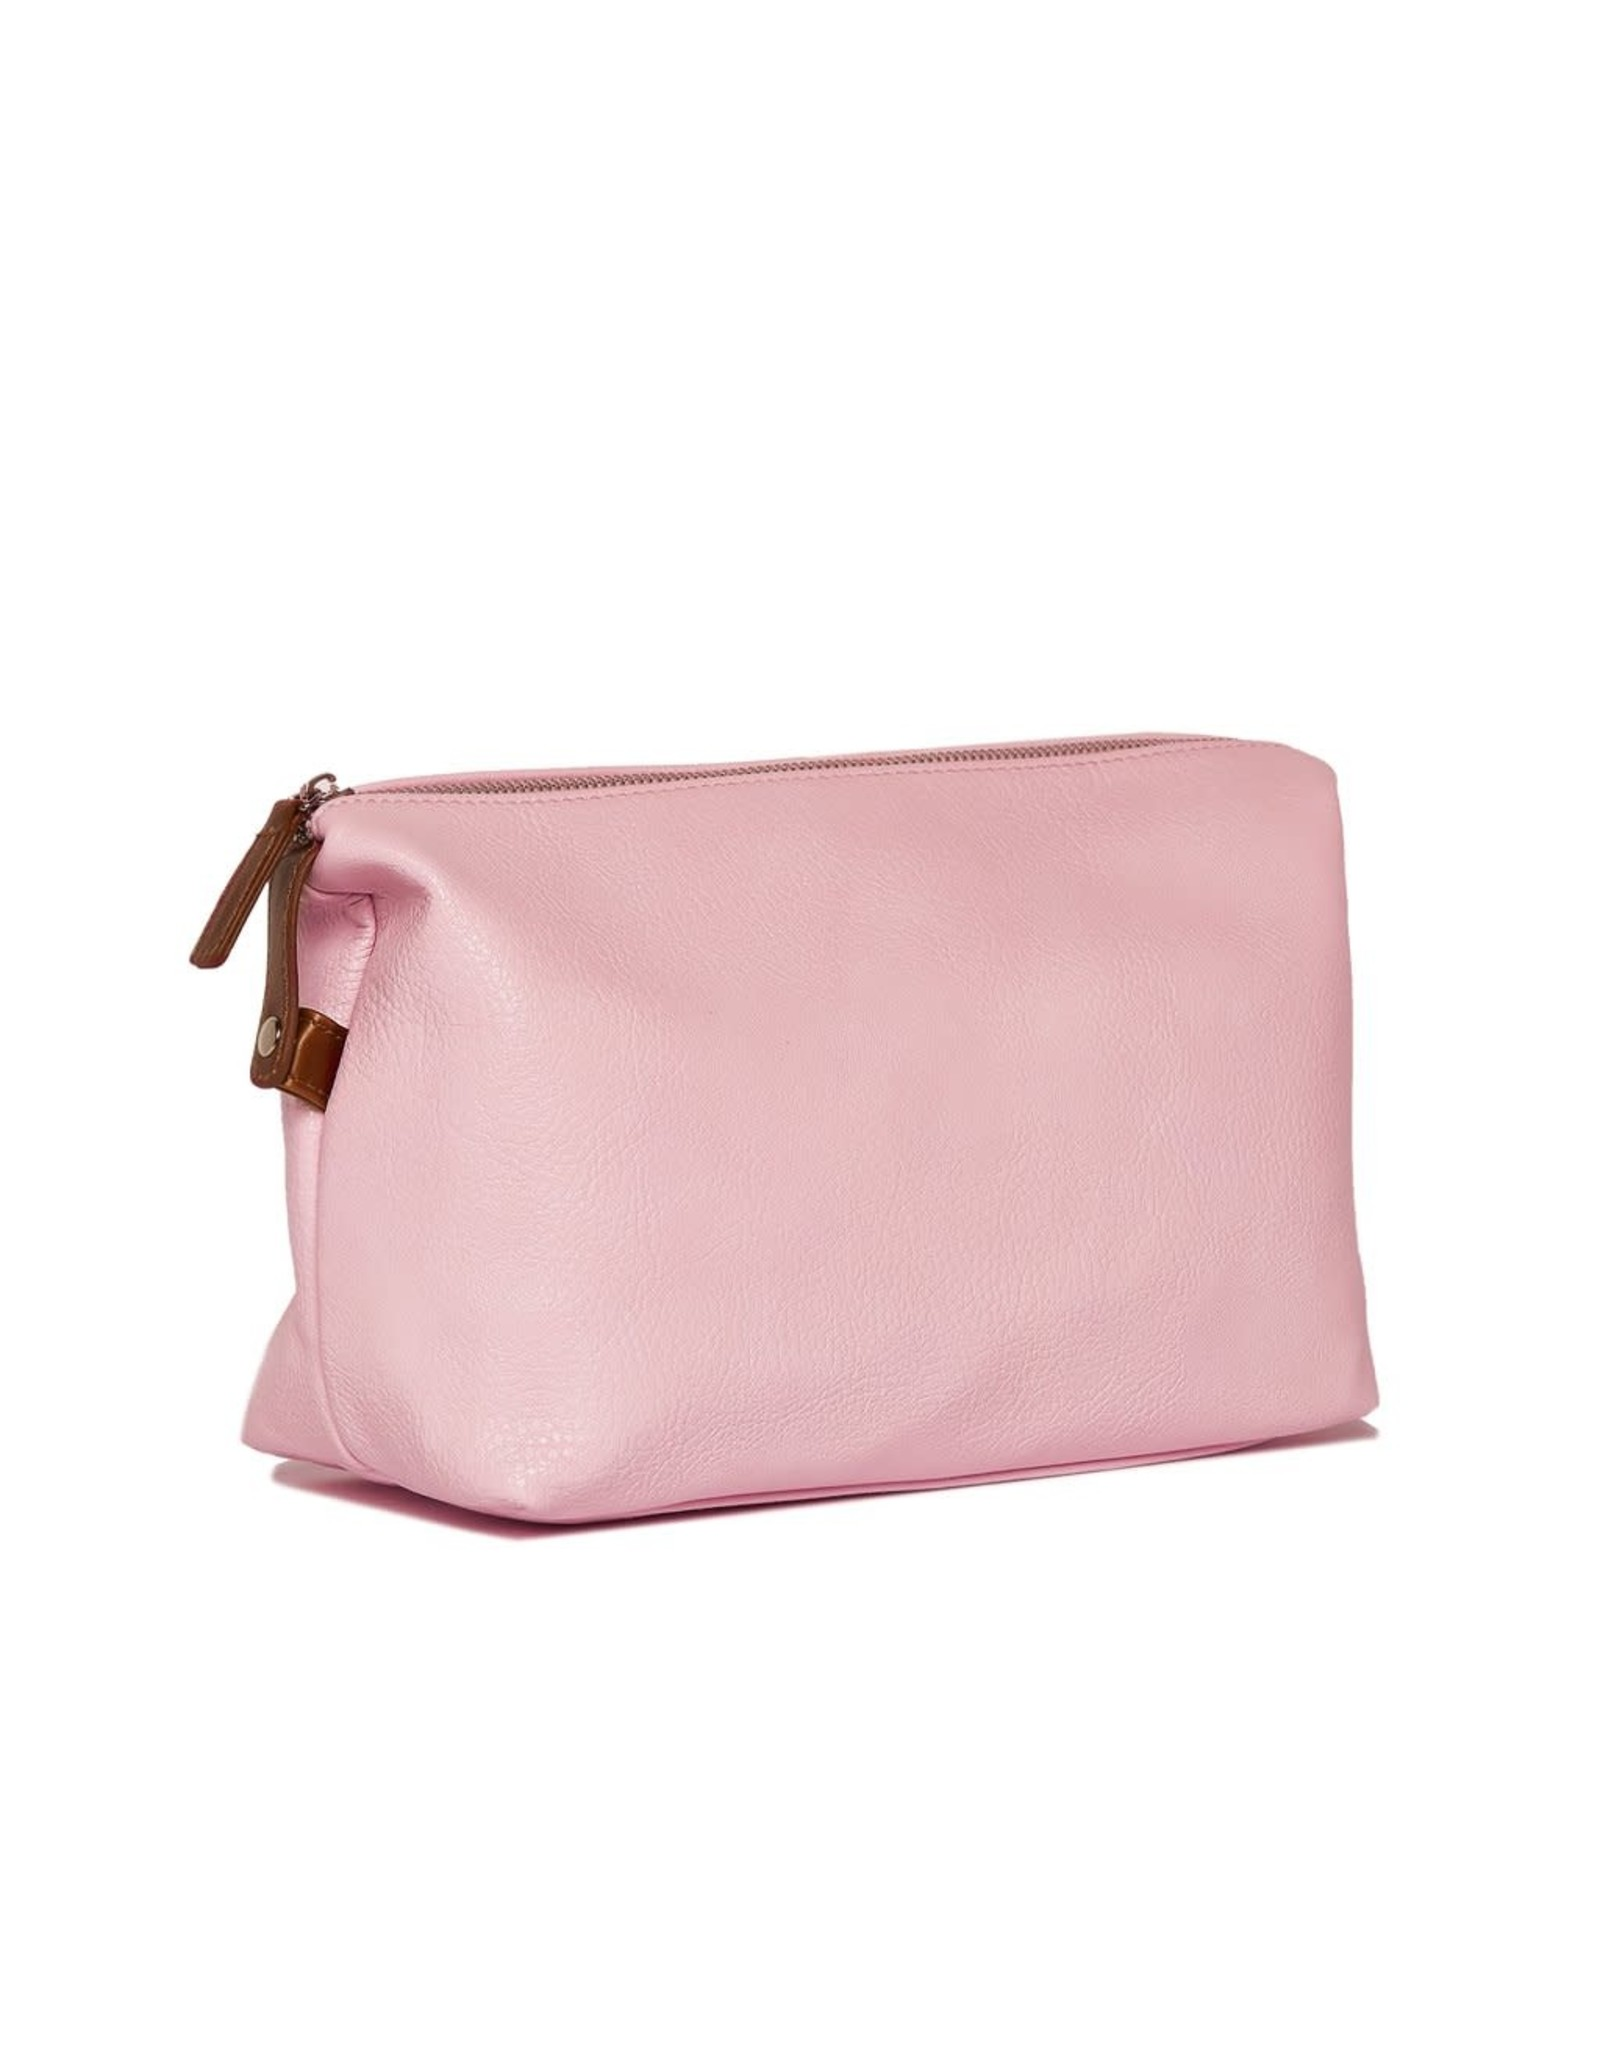 Brouk & Co Croft Dopp Kit Pink